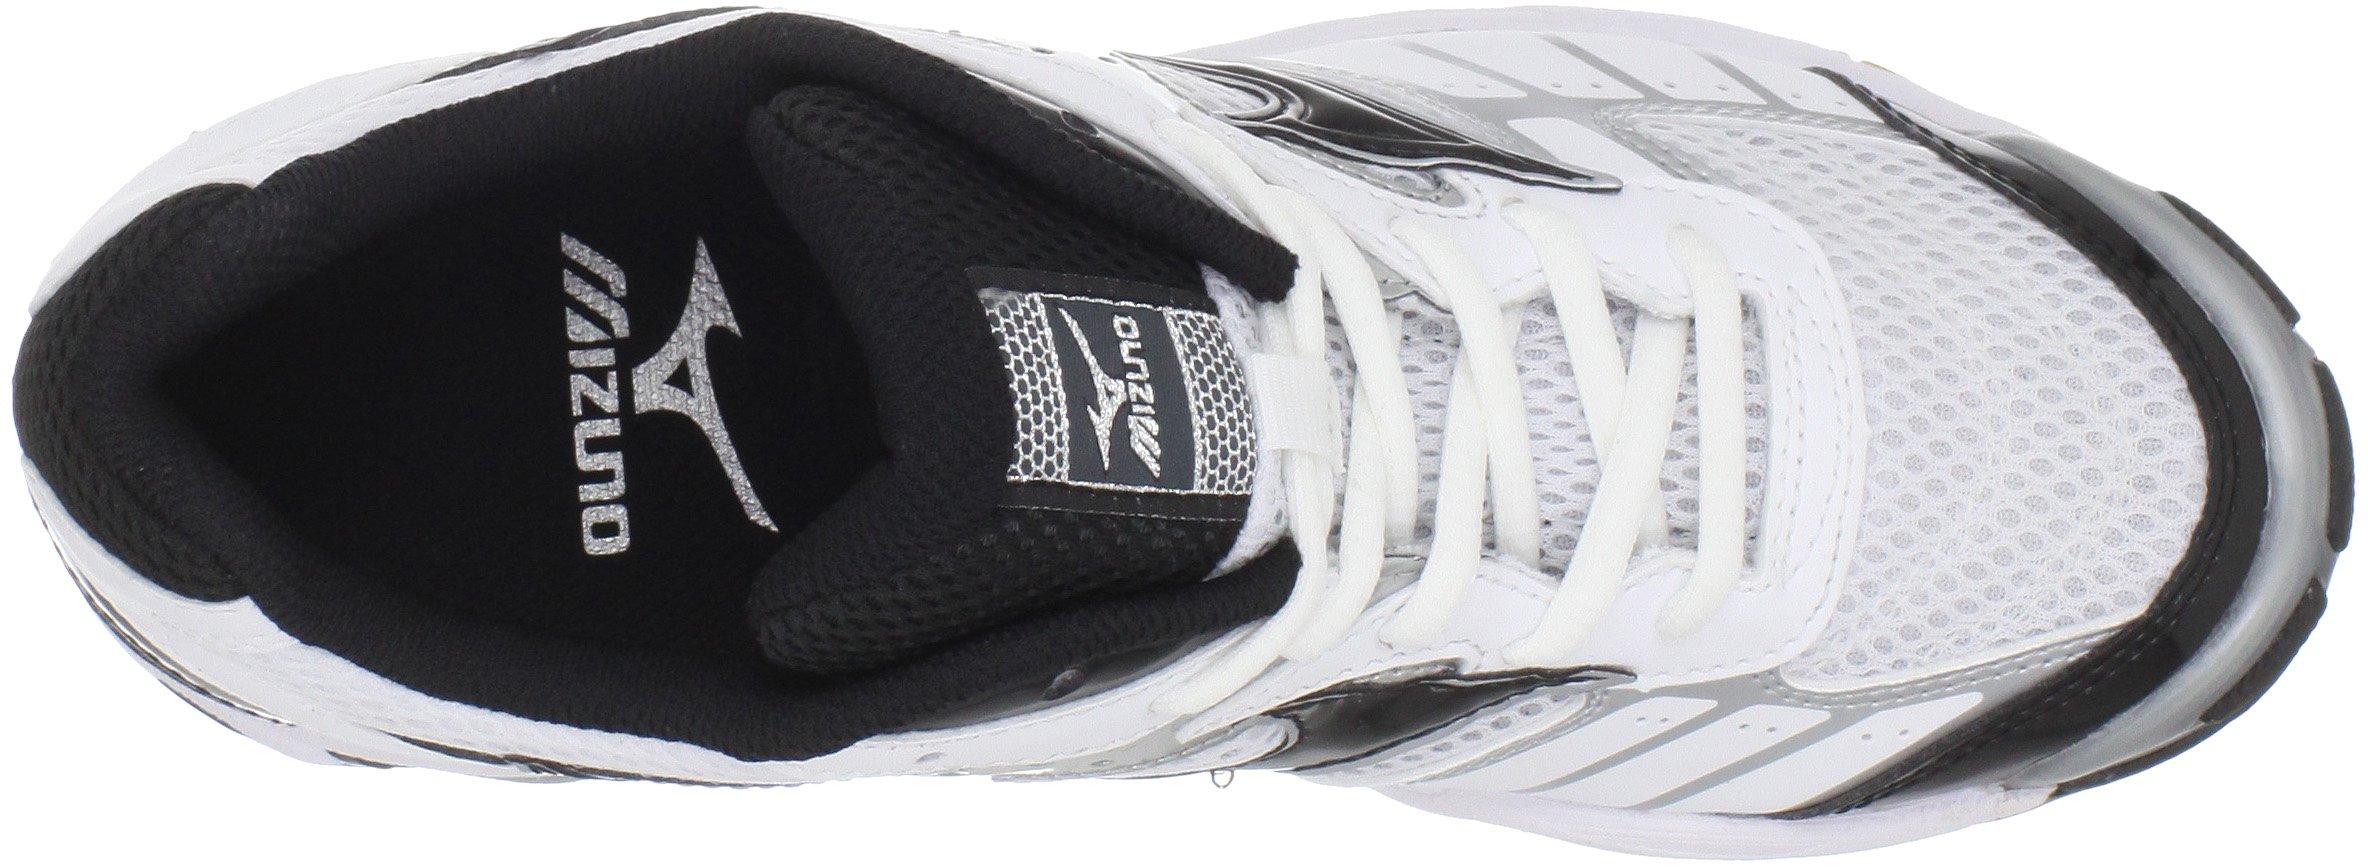 Mizuno Women's Wave Bolt Volleyball Shoe,White/Black,9 M US by Mizuno (Image #7)